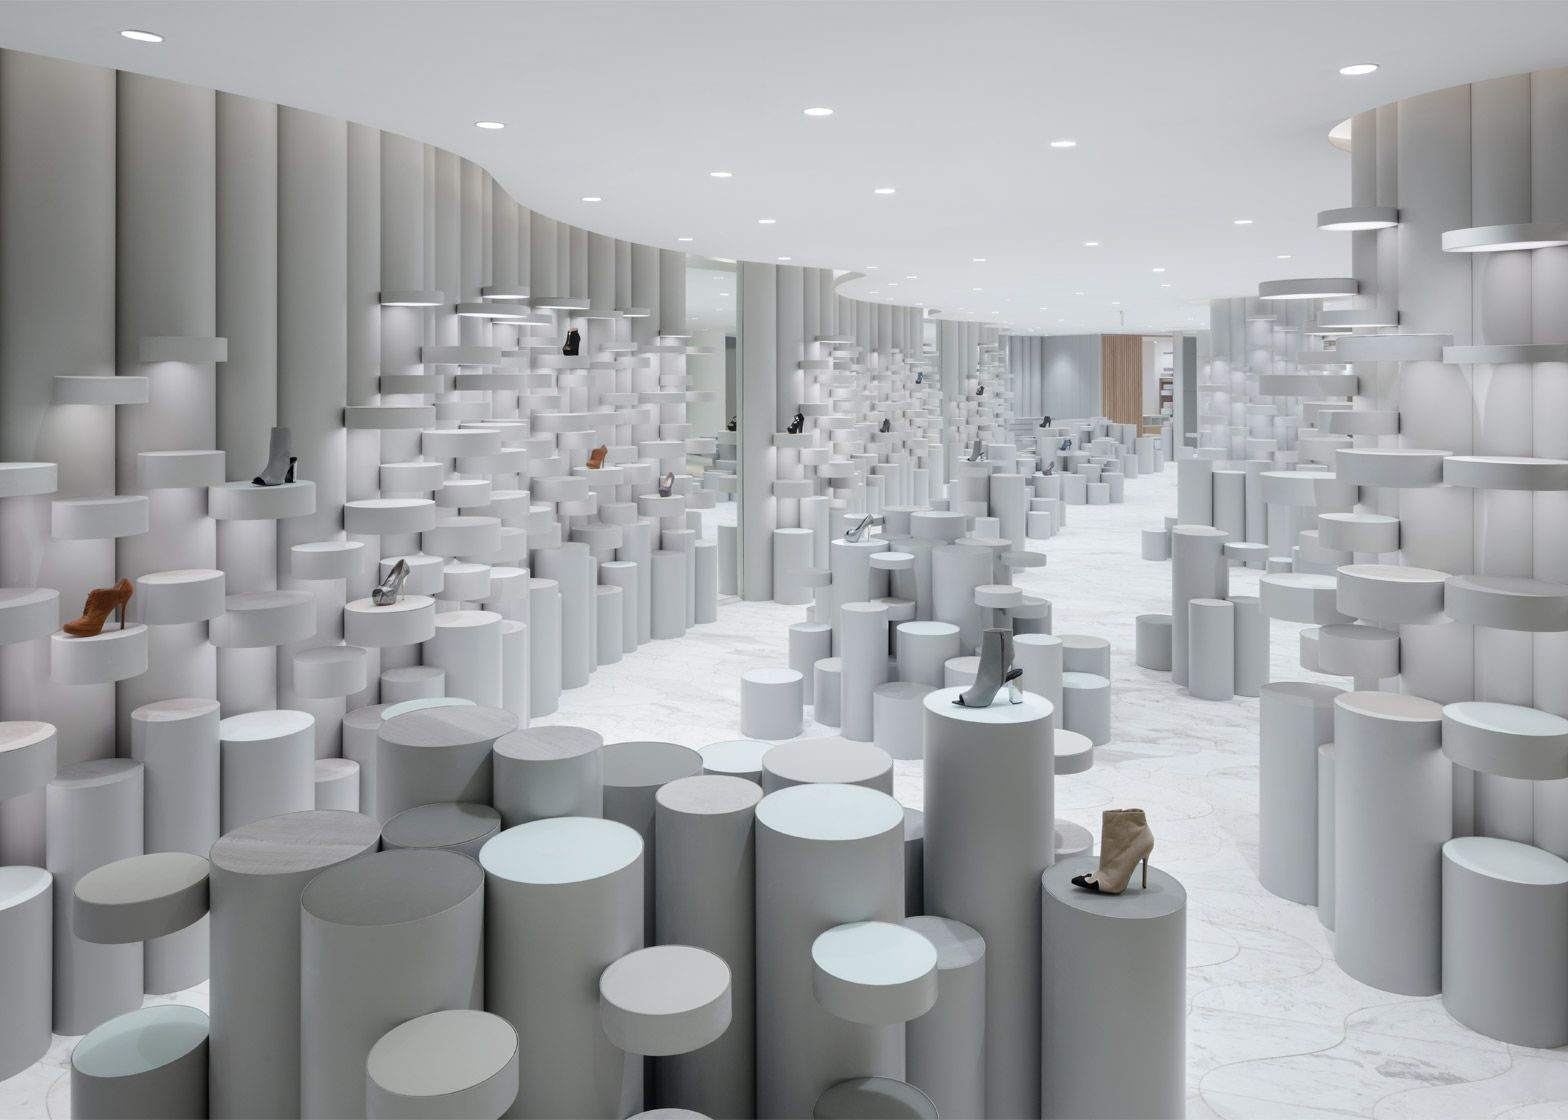 Retail Architecture: Siam Discover shopping centre in Bangkok by Nendo